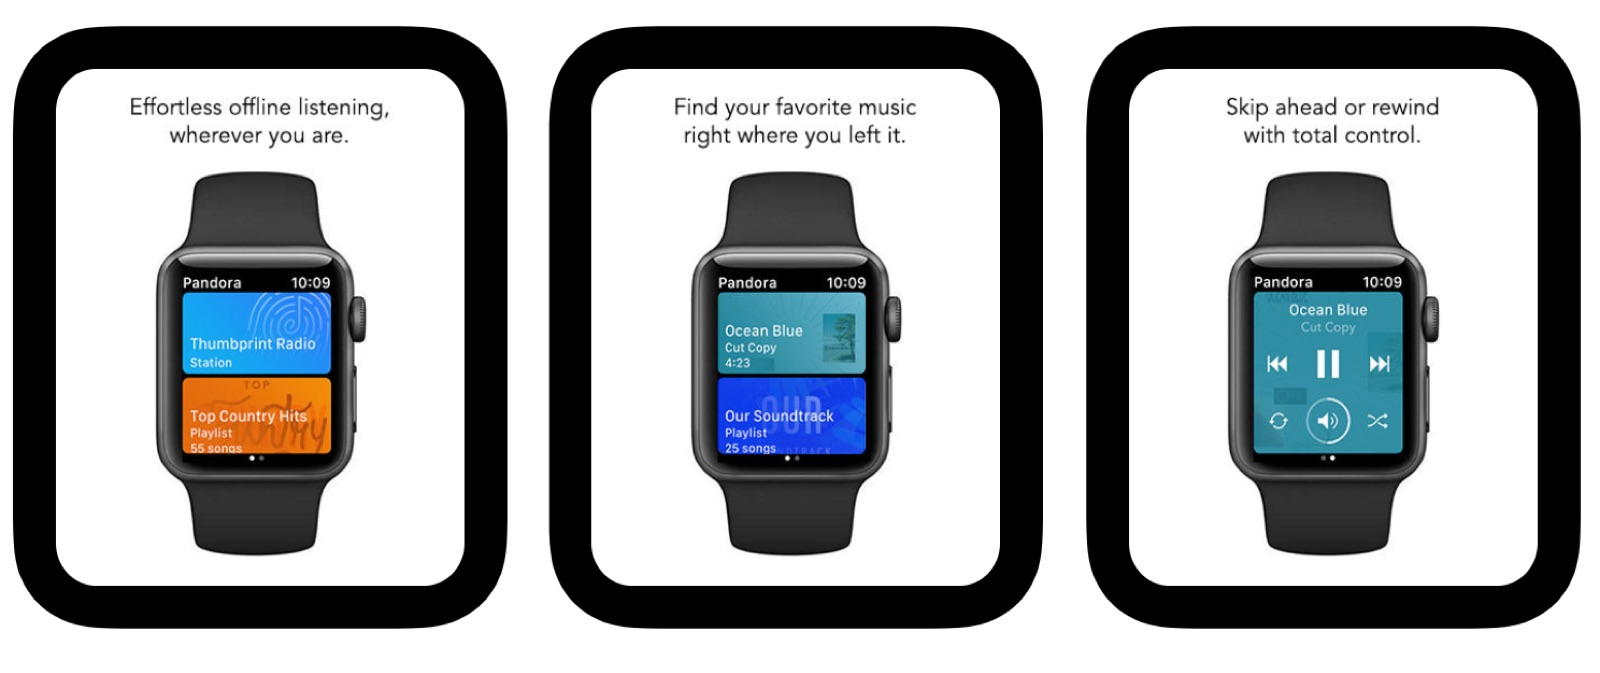 Pandora iOS App Update Brings Offline Playback Feature for Apple Watch